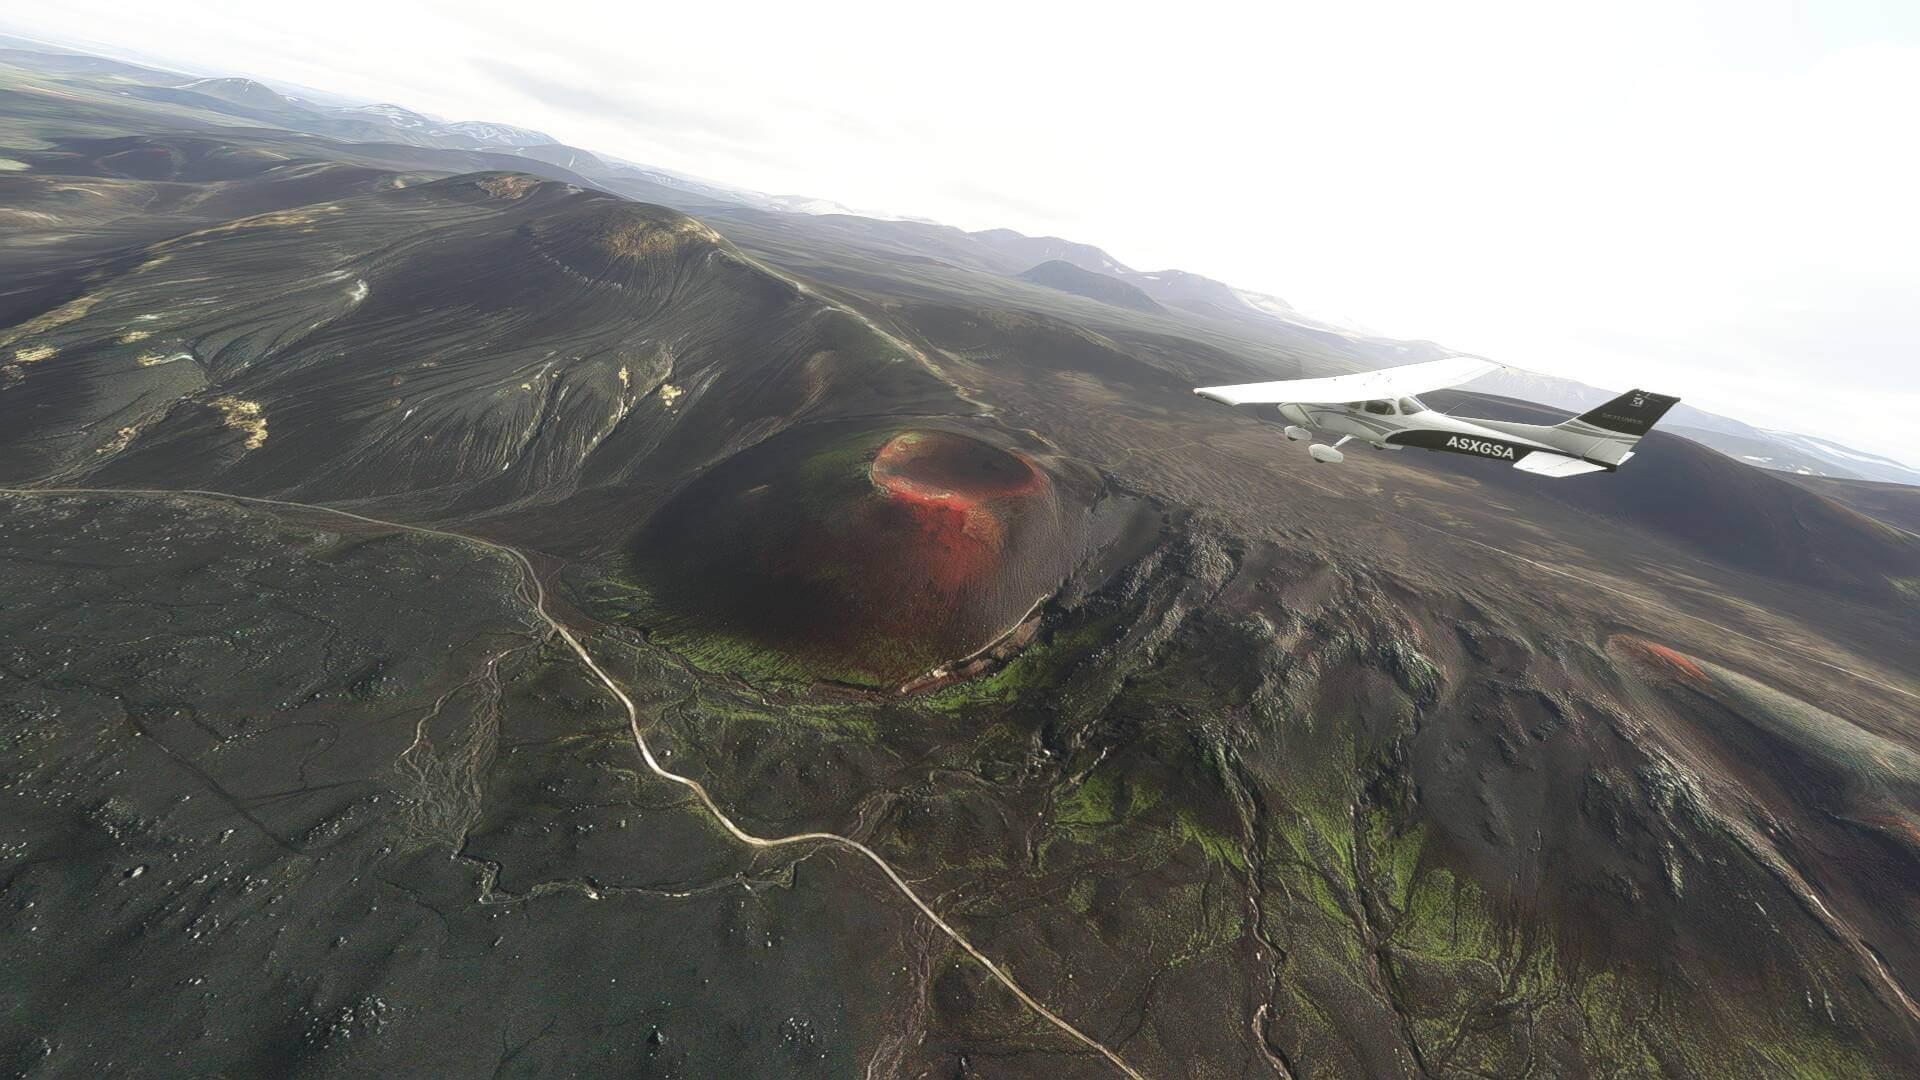 Plane flying over Iceland